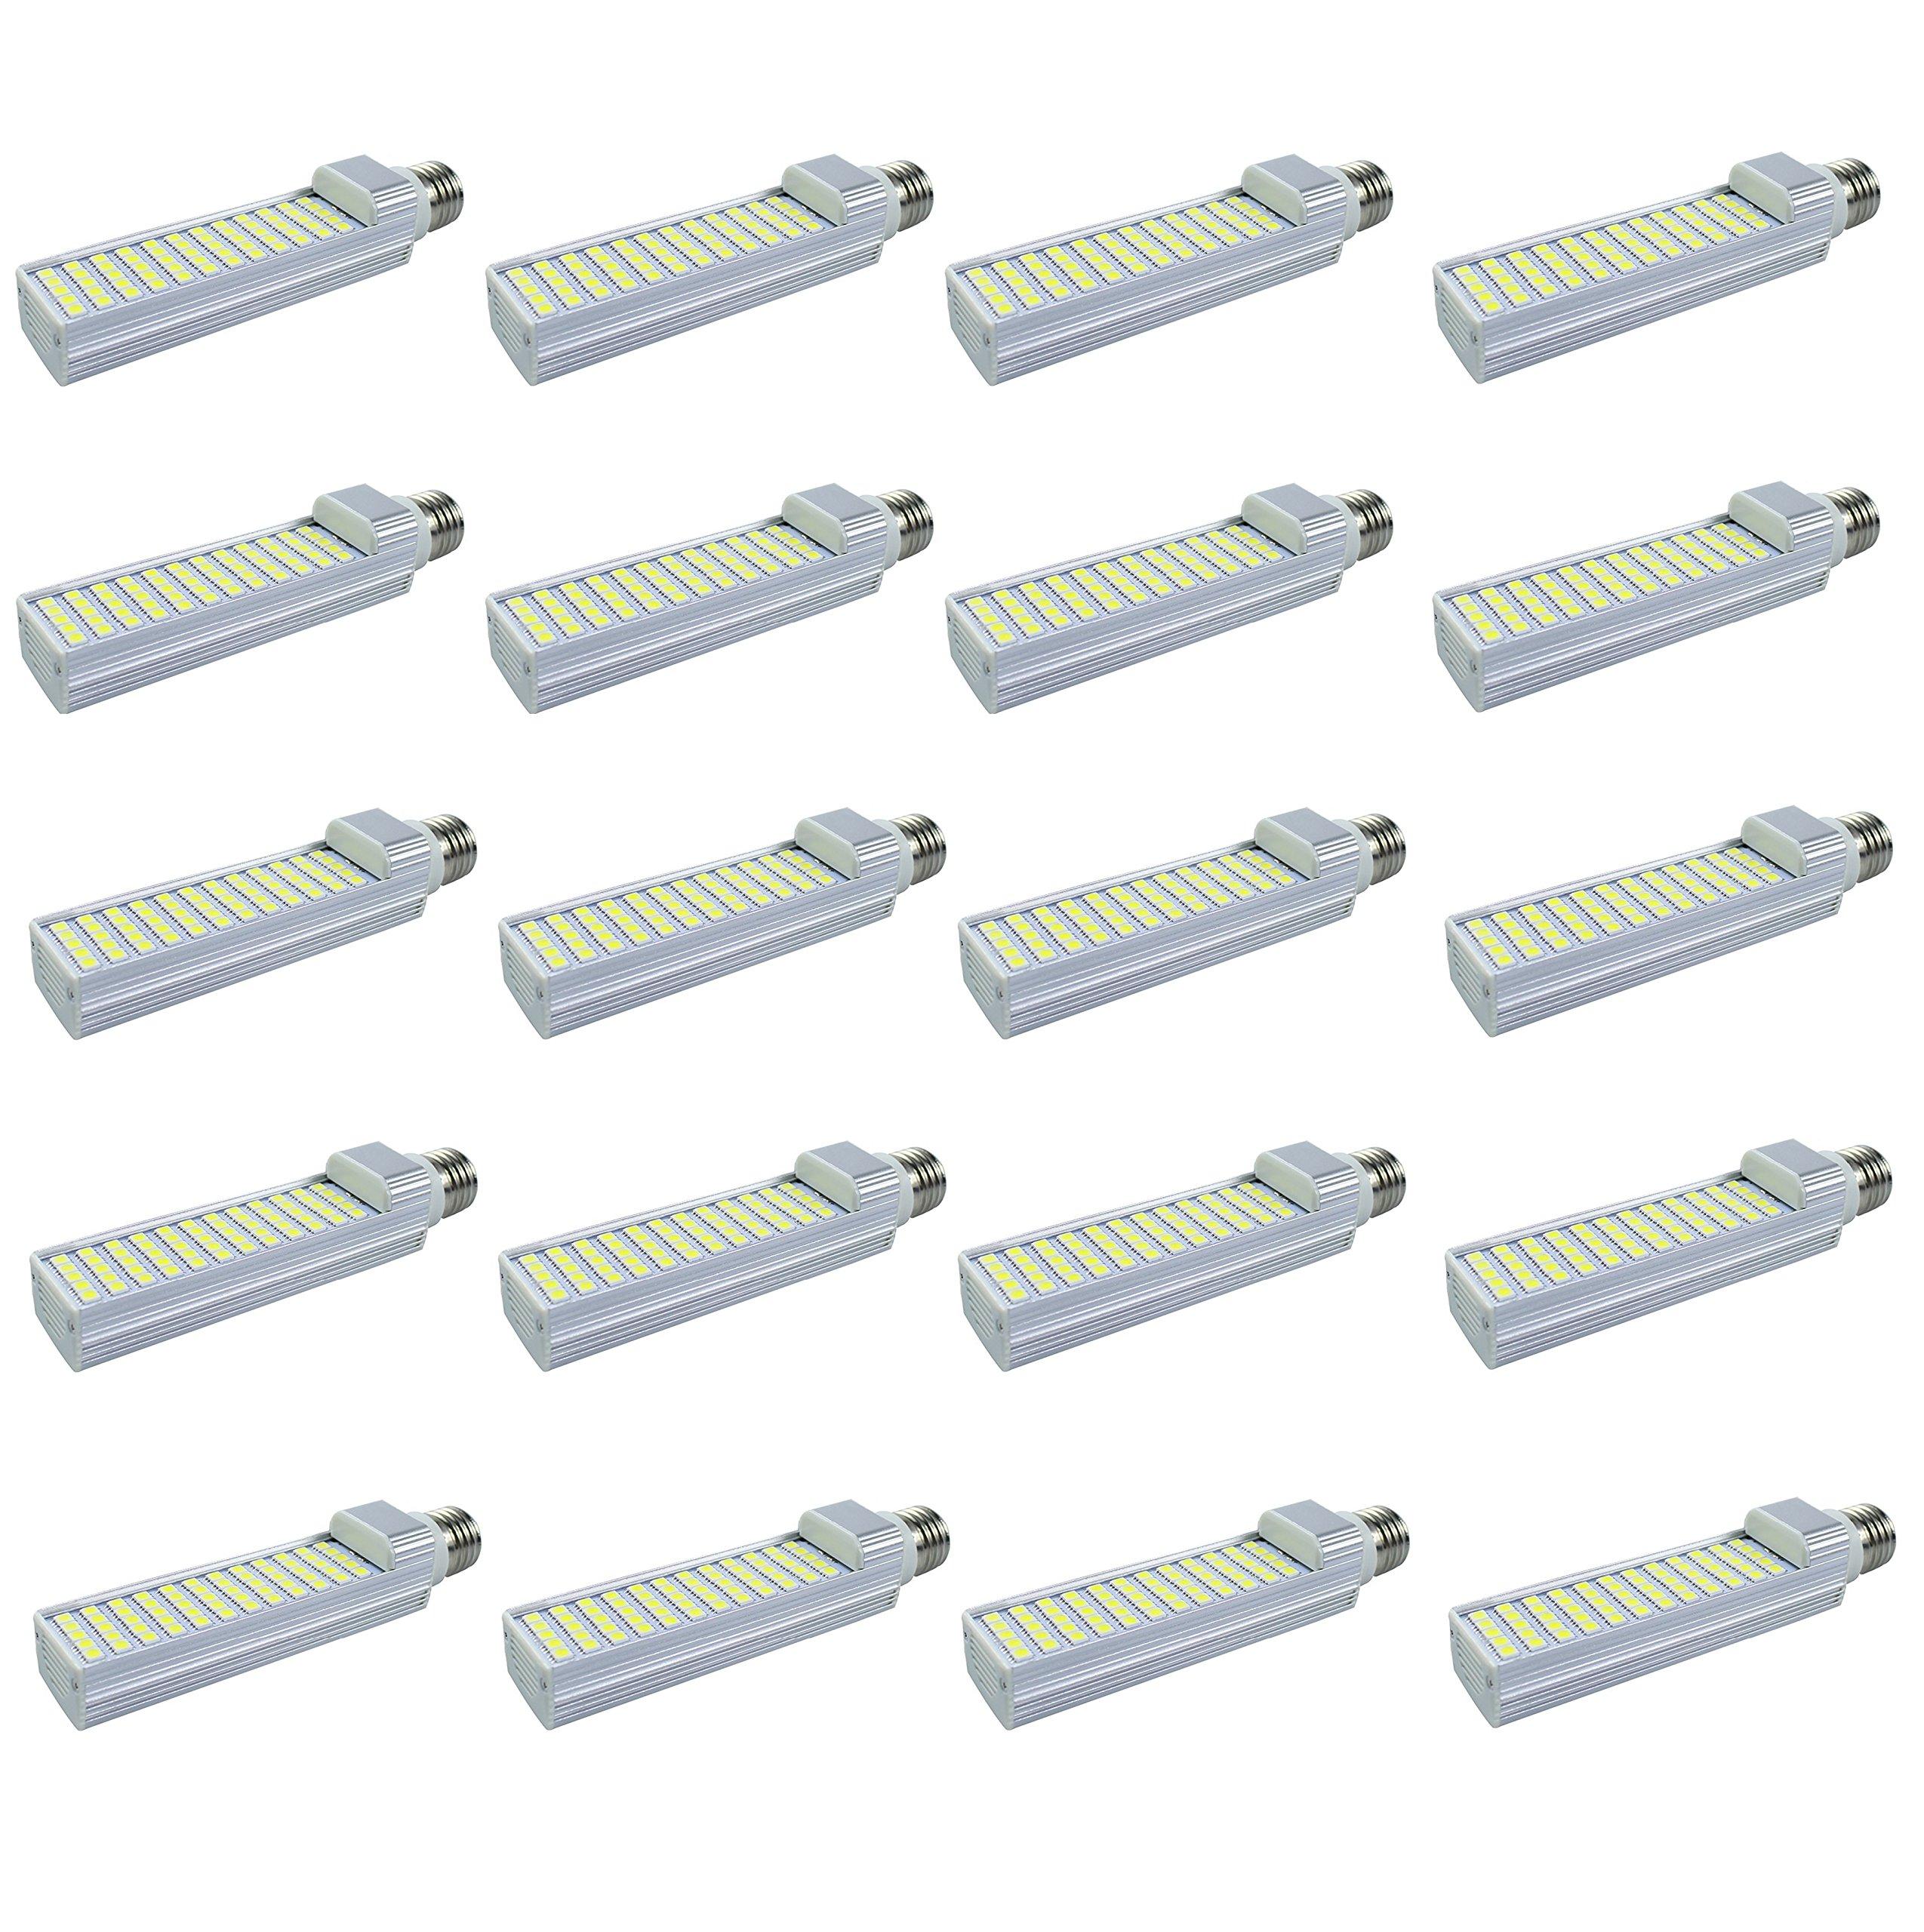 Masonanic LED 12W G24 Compact Fluorescent Lamp Rotatable Aluminum Lamp G24 E26LED CFL/Compact Fluorescent Lamp,30W CFL Equivalent (6000K Cool White, 20 Pack)